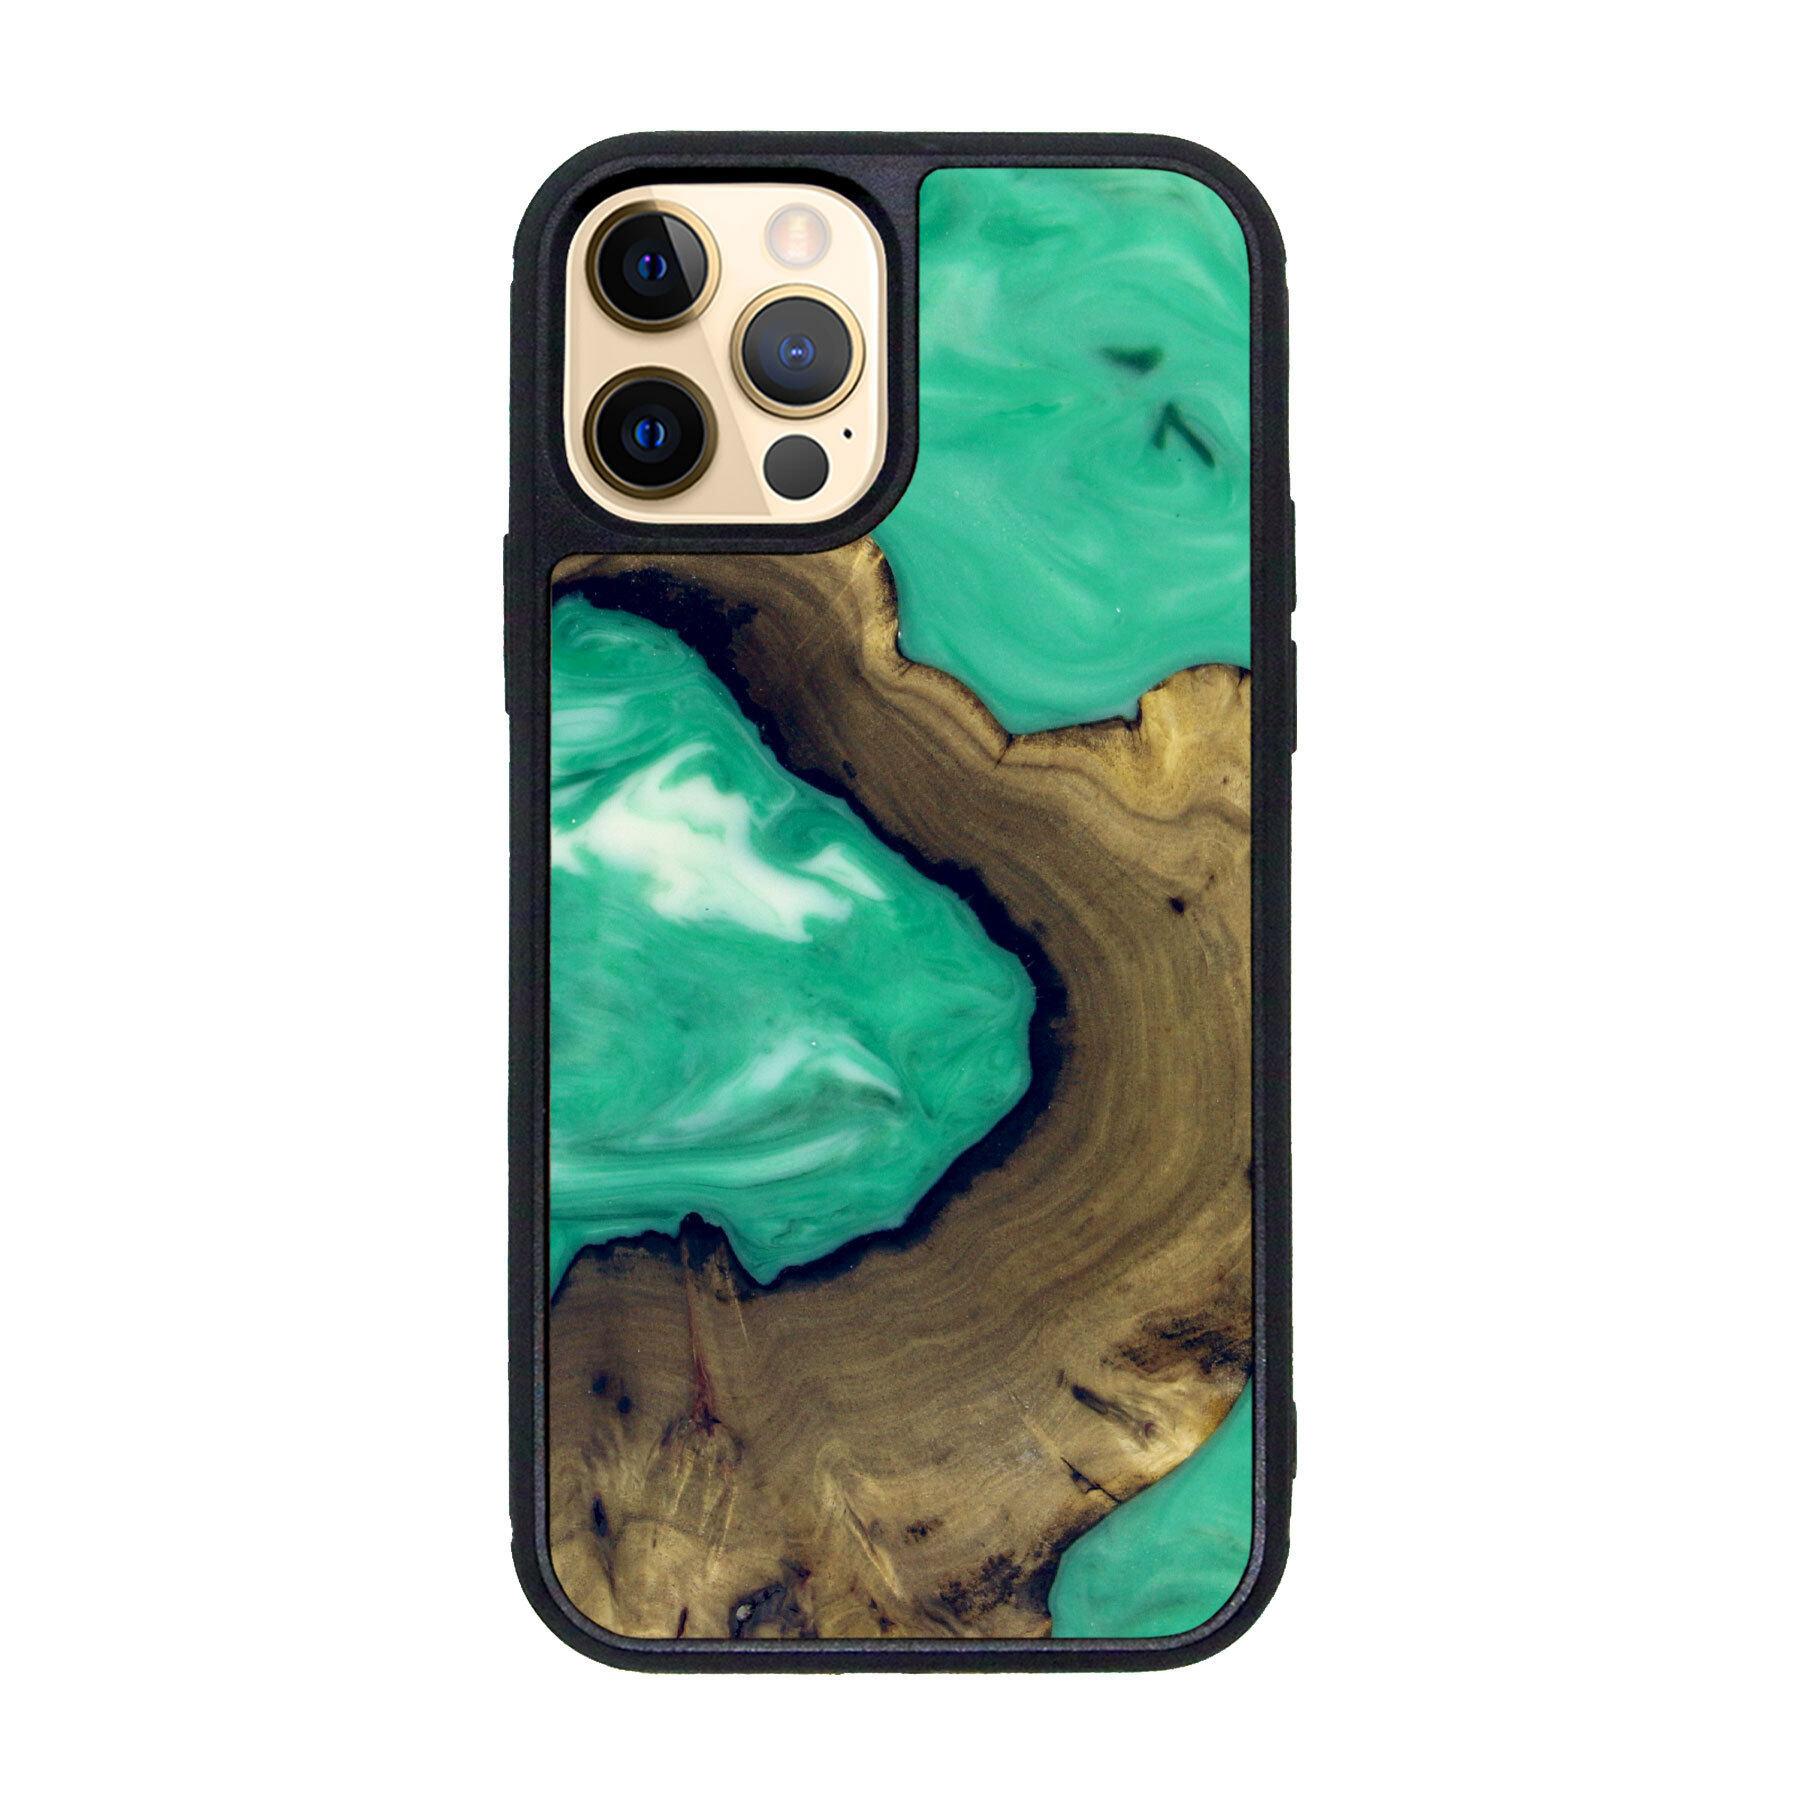 iPhone 12 Pro Phone Case